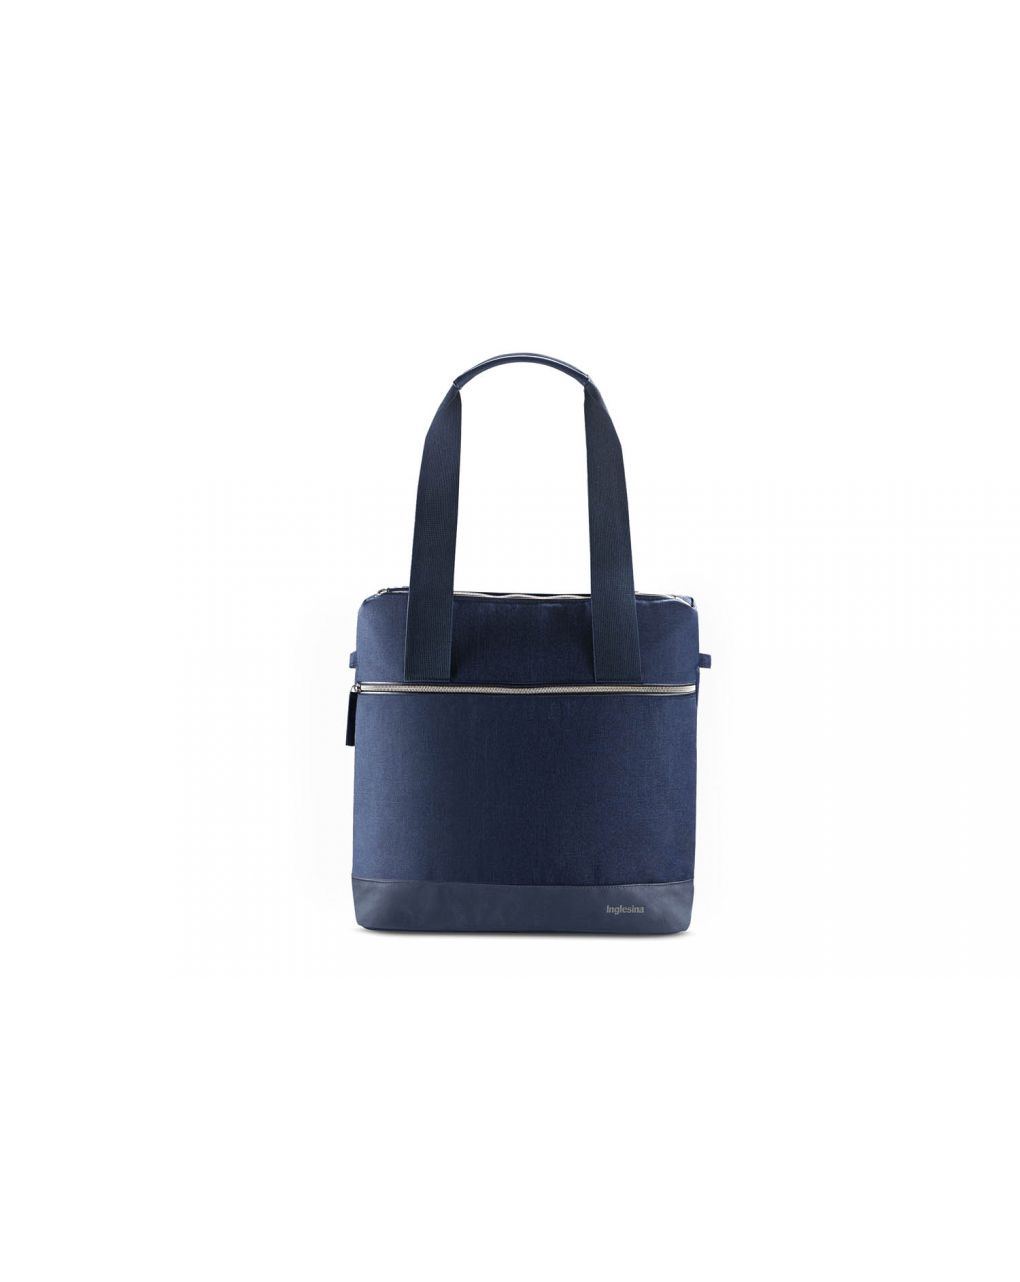 Inglesina Τσάντα Αλλαξιέρα Back Bag Aptica Portland Blue